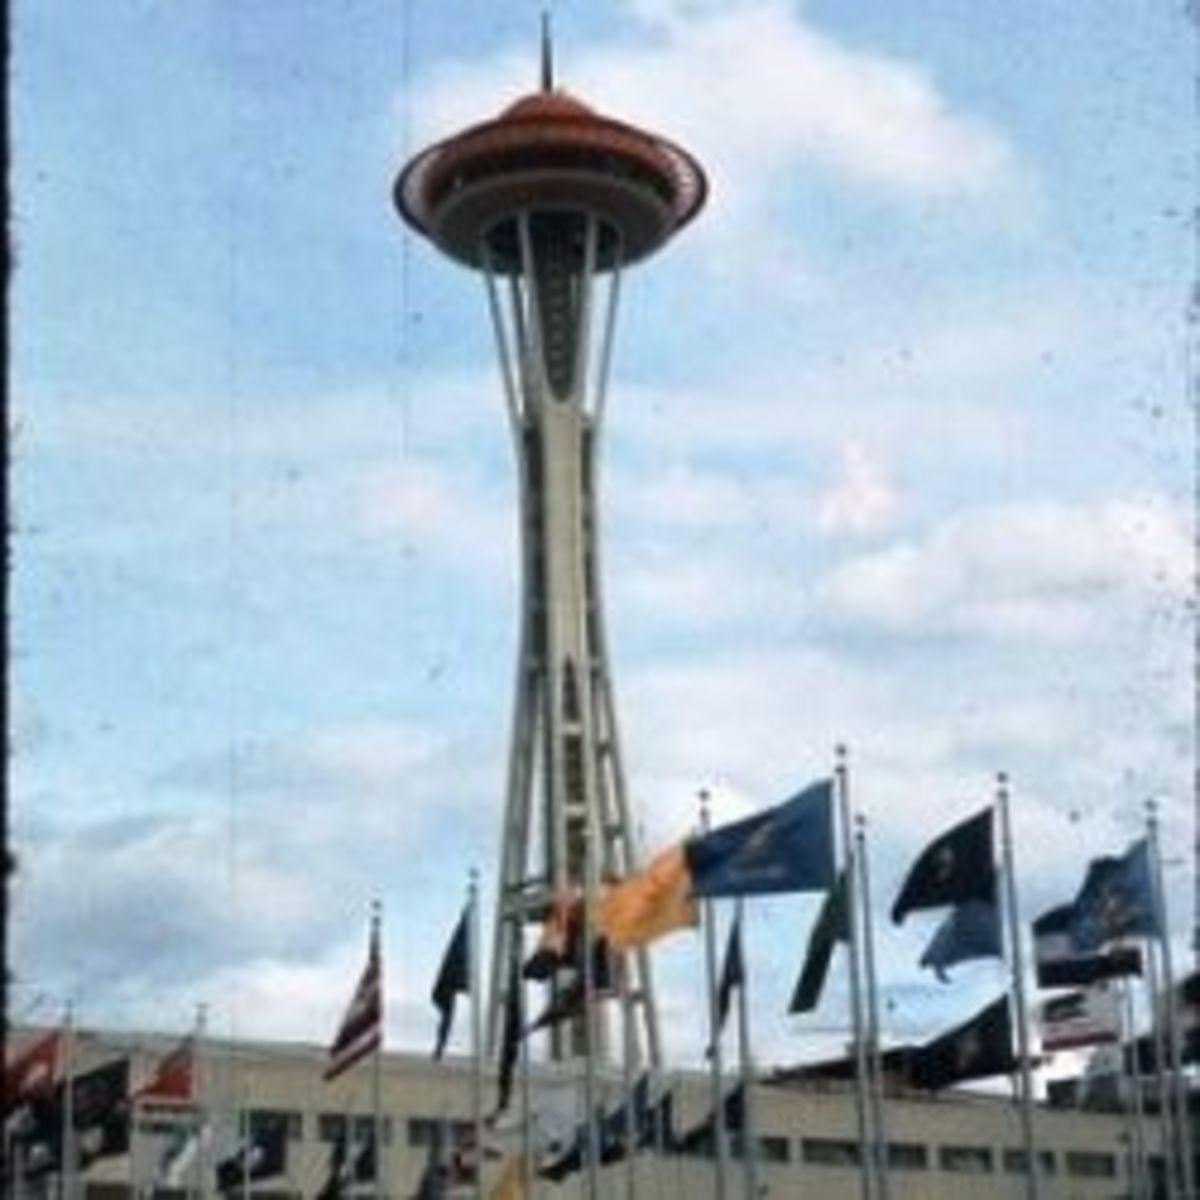 The 1962 Seattle World's Fair